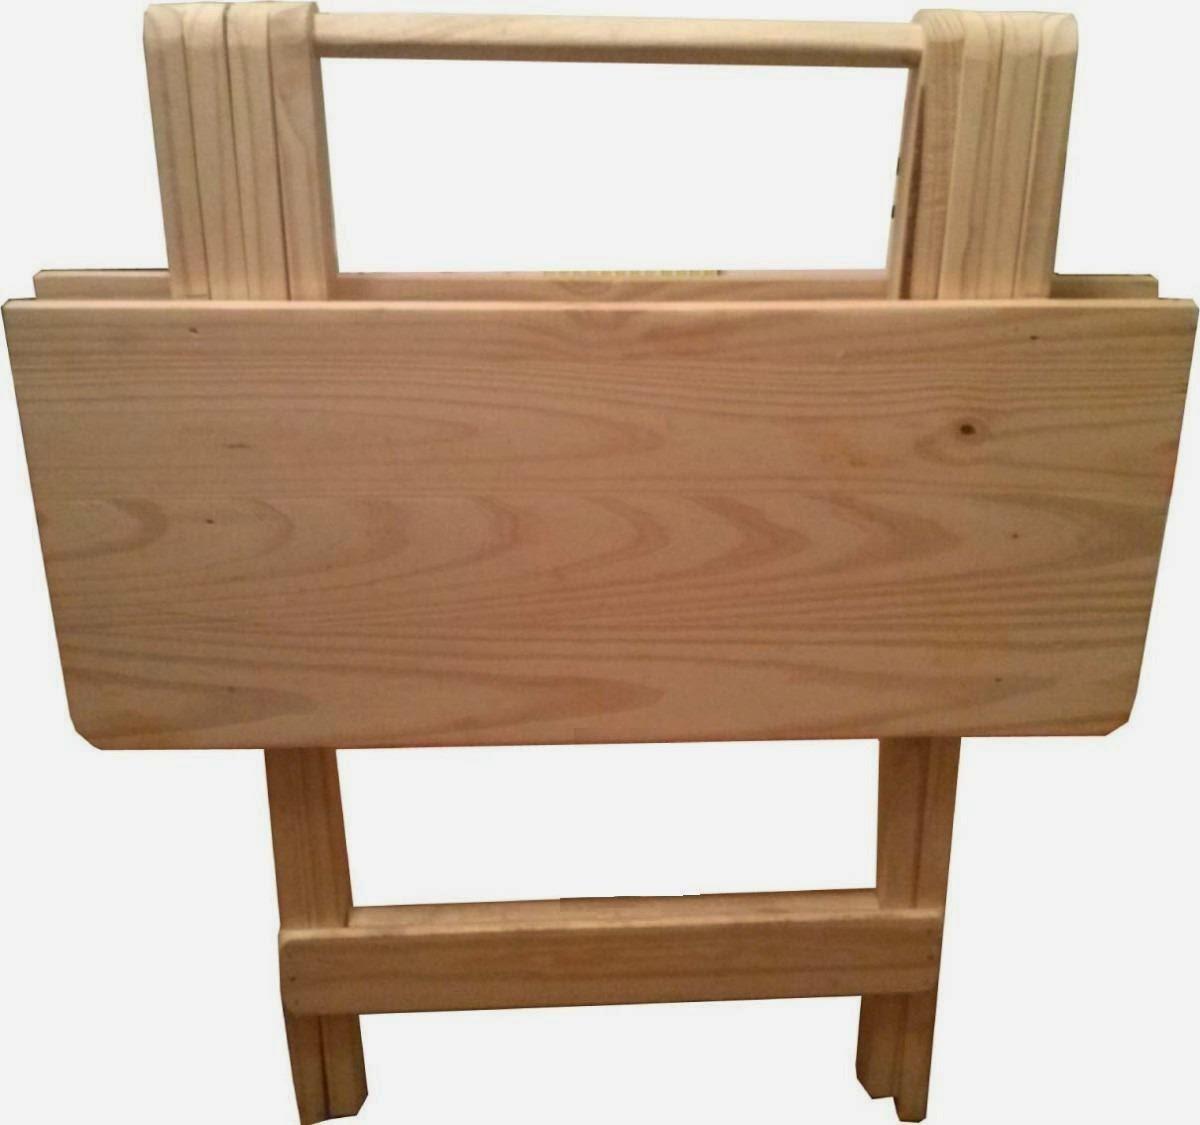 Mesas Con Sillas Plegables Dise Os Arquitect Nicos Mimasku Com # Muebles Plegables